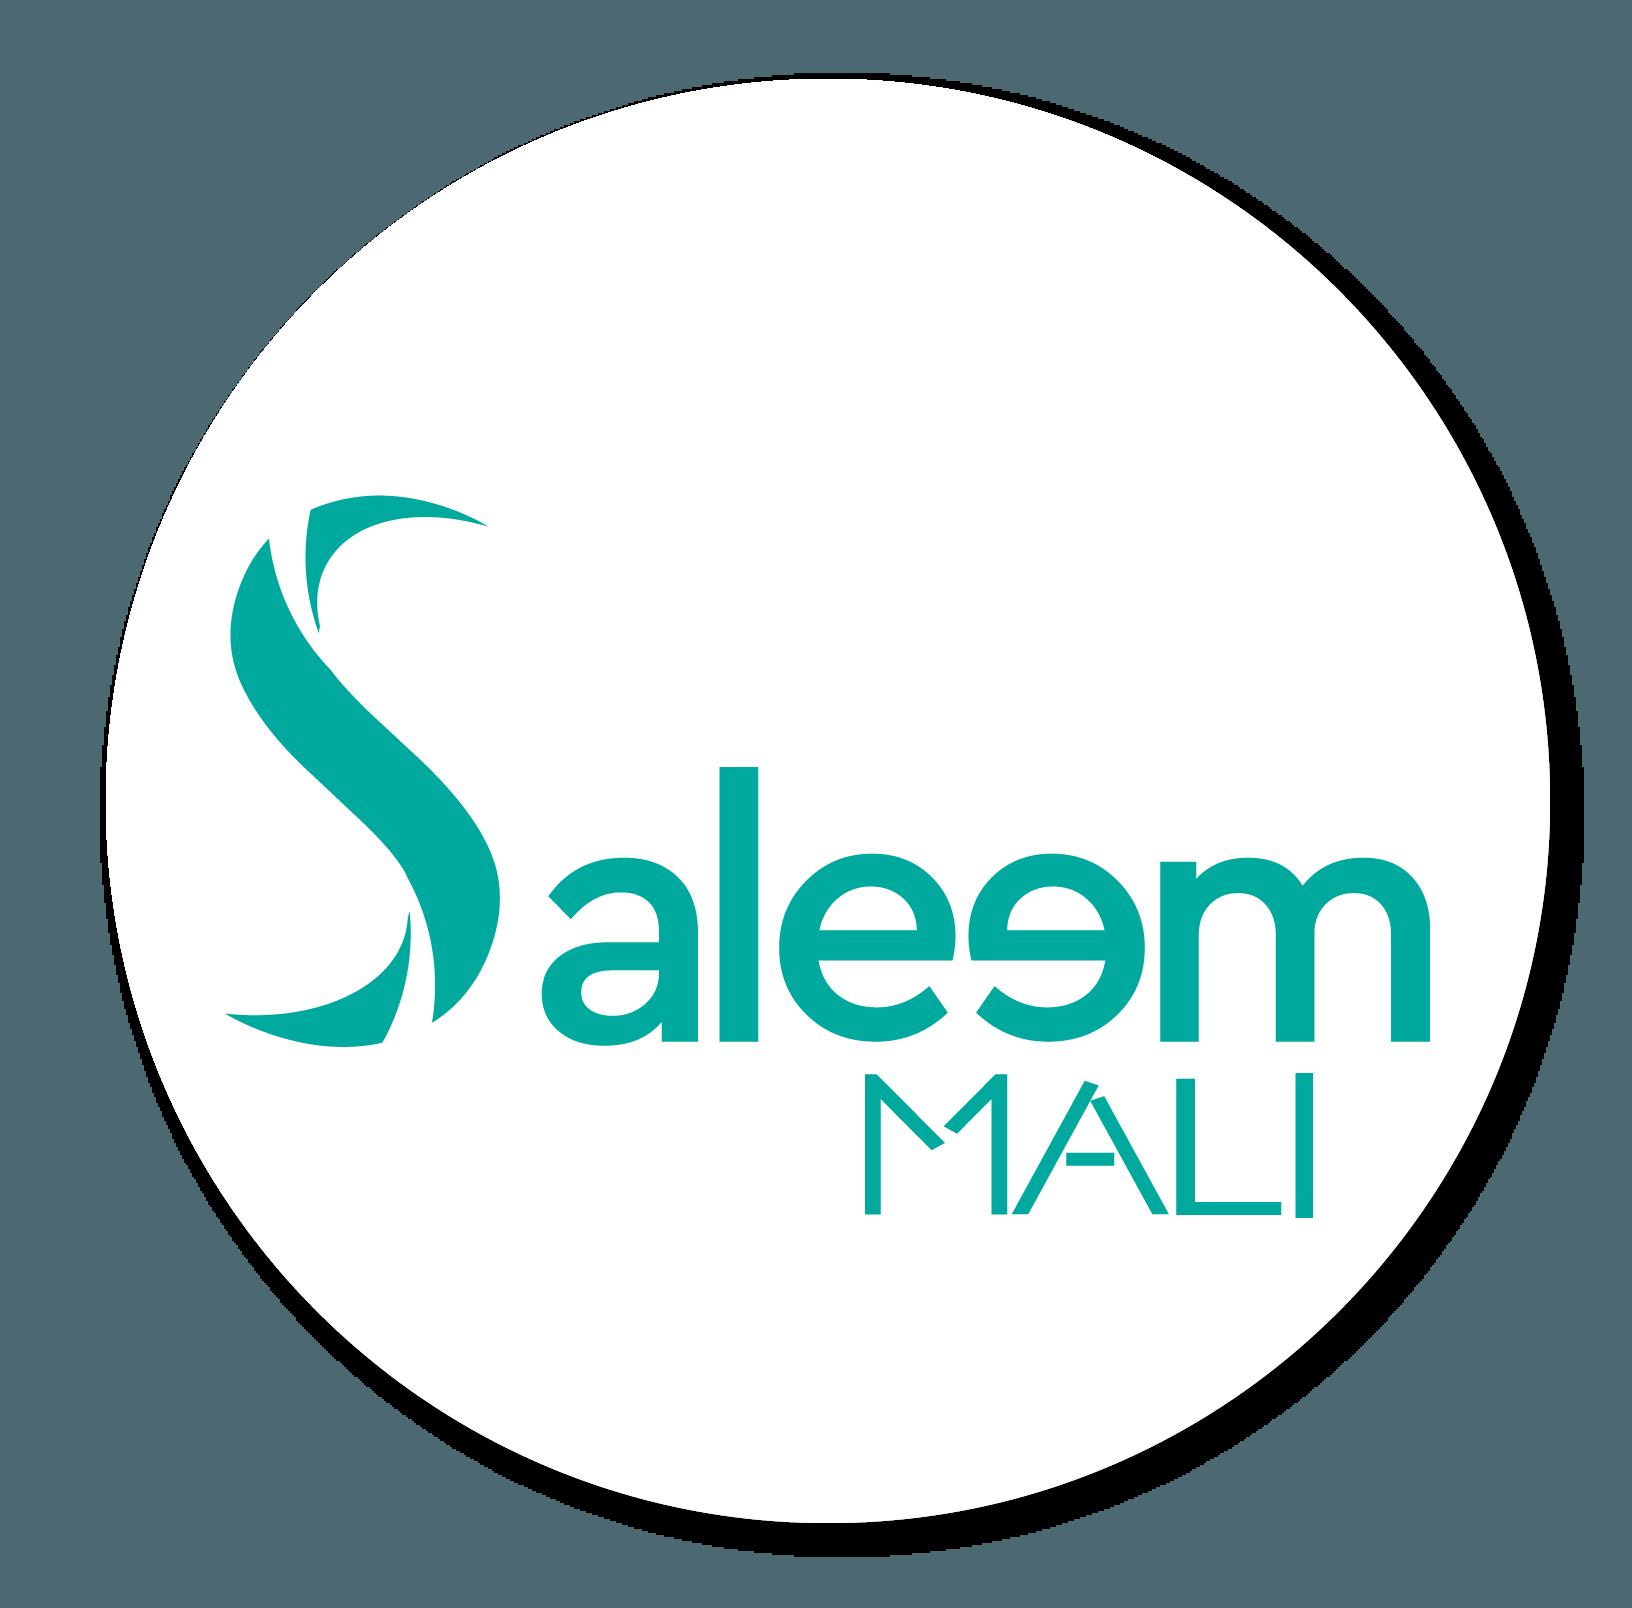 Saleem Mali